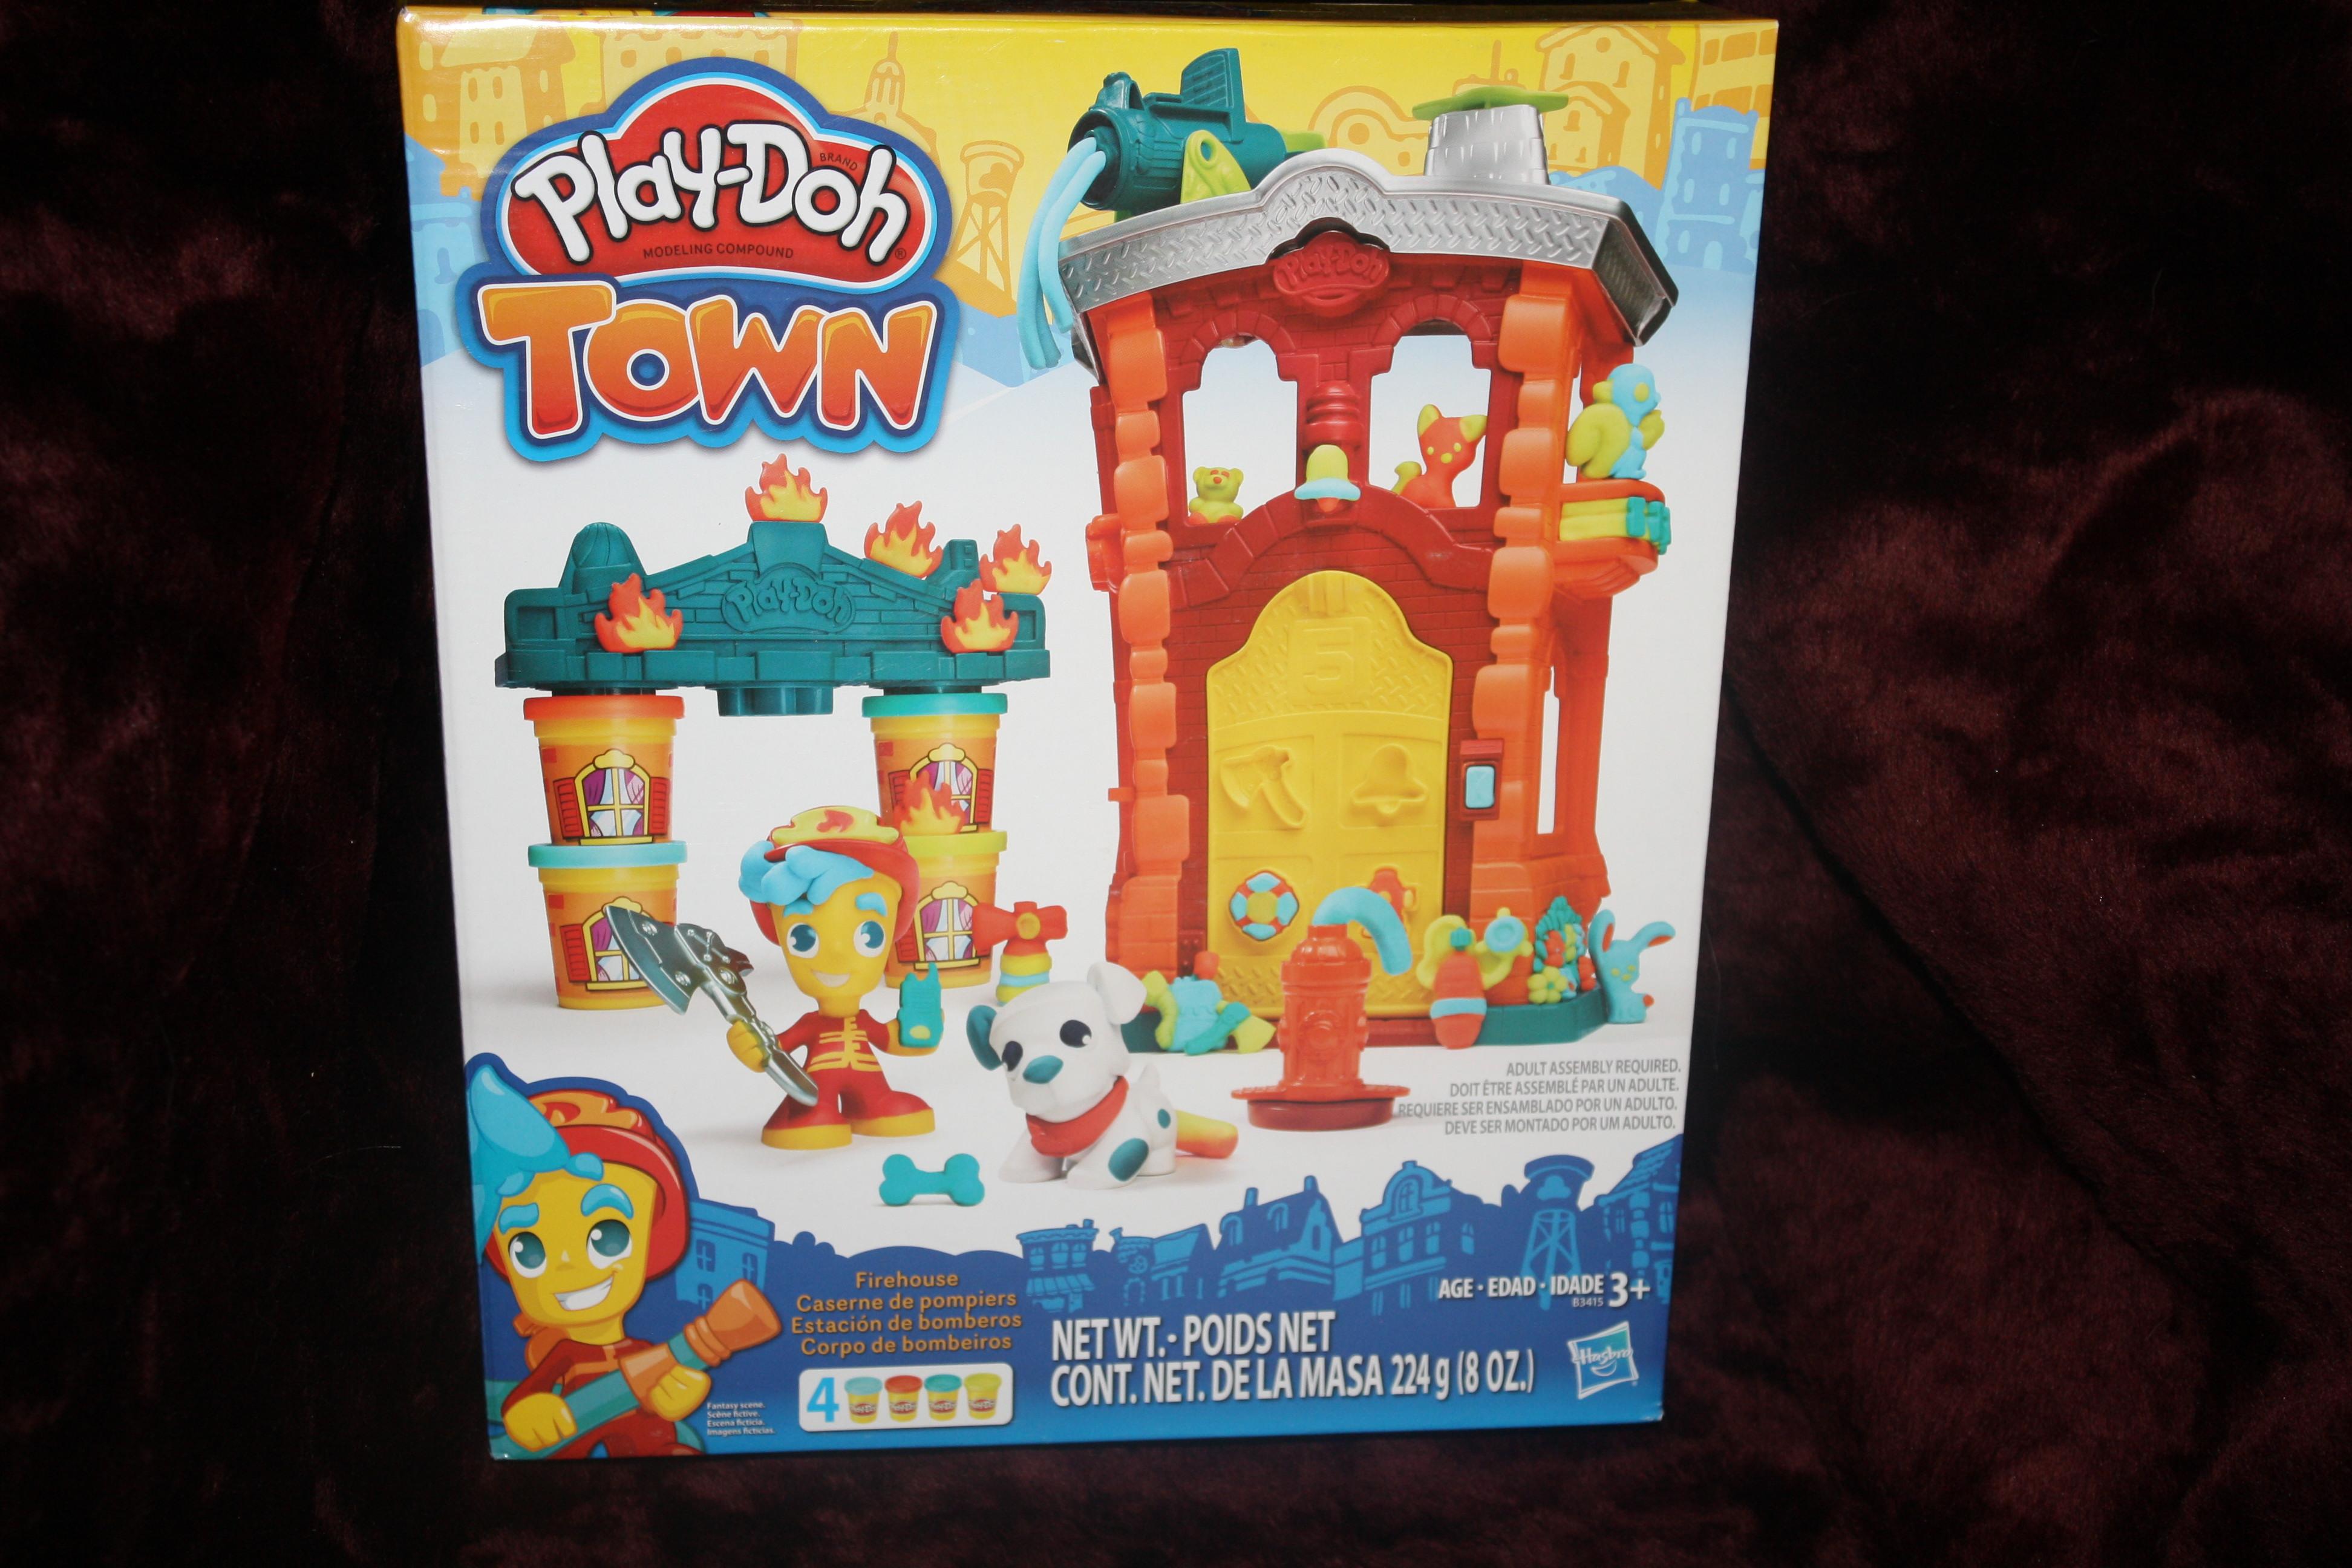 79. Playdoh town